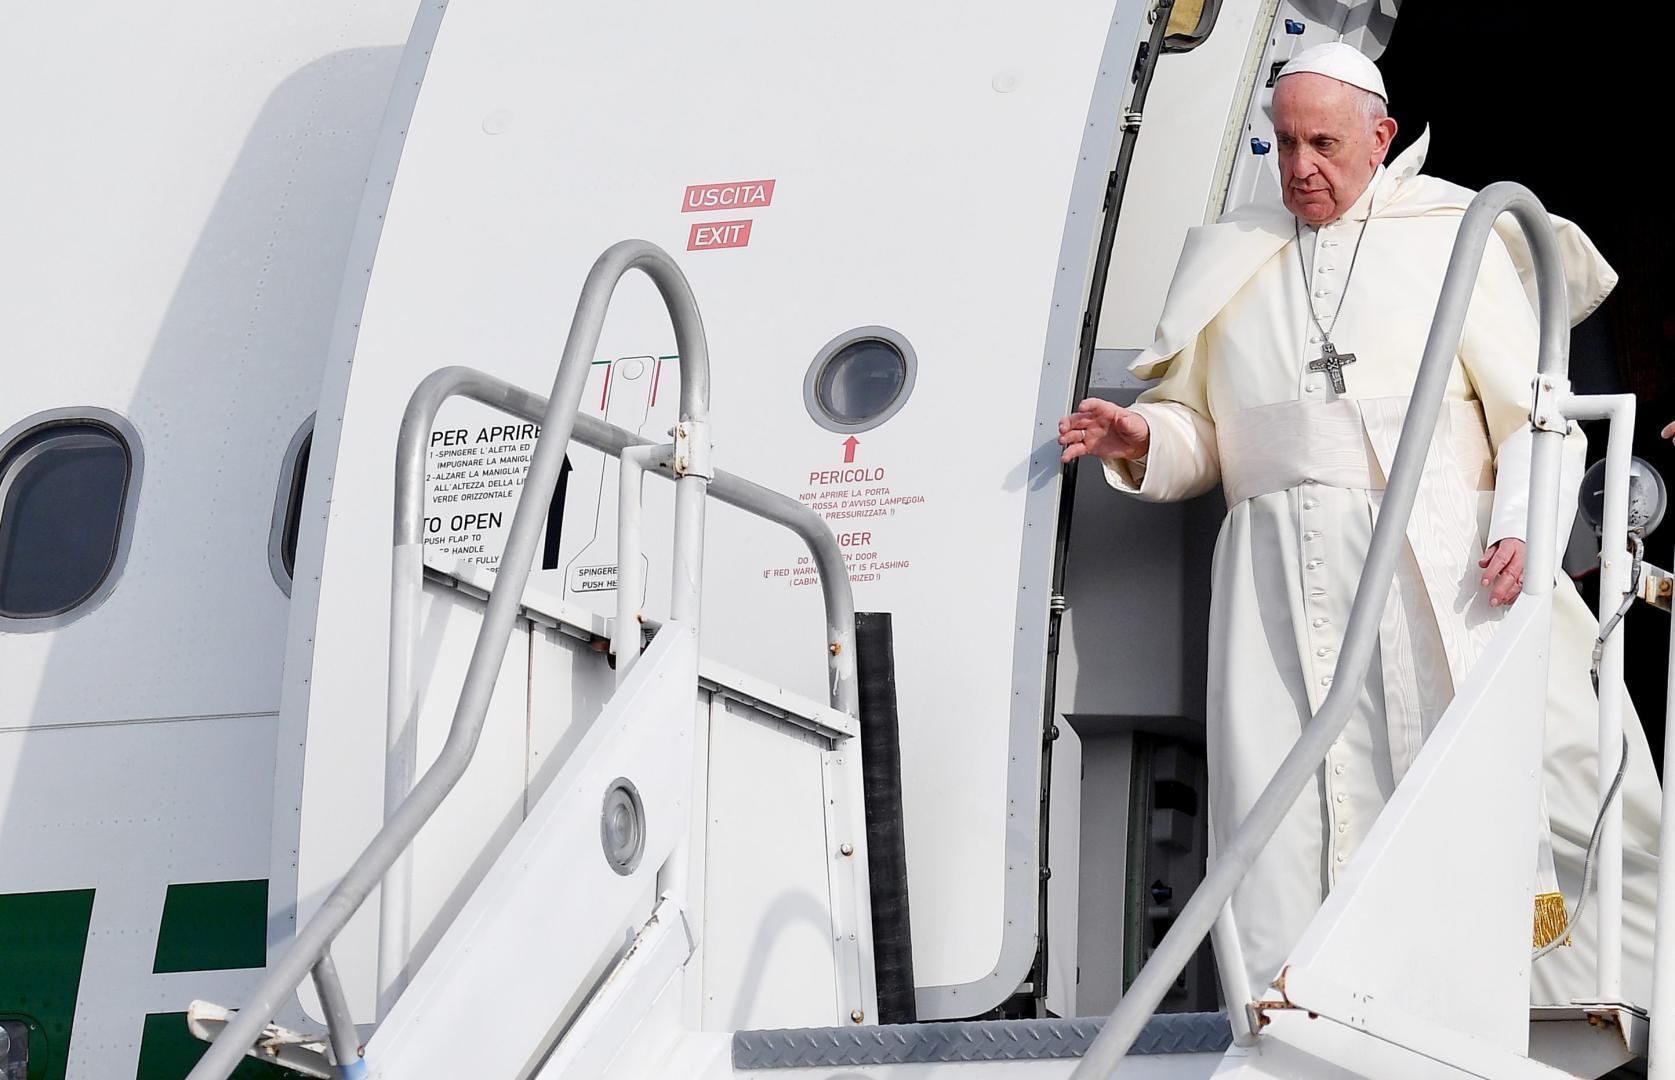 Papa-Francisc, turneu diplomatic în Balcani